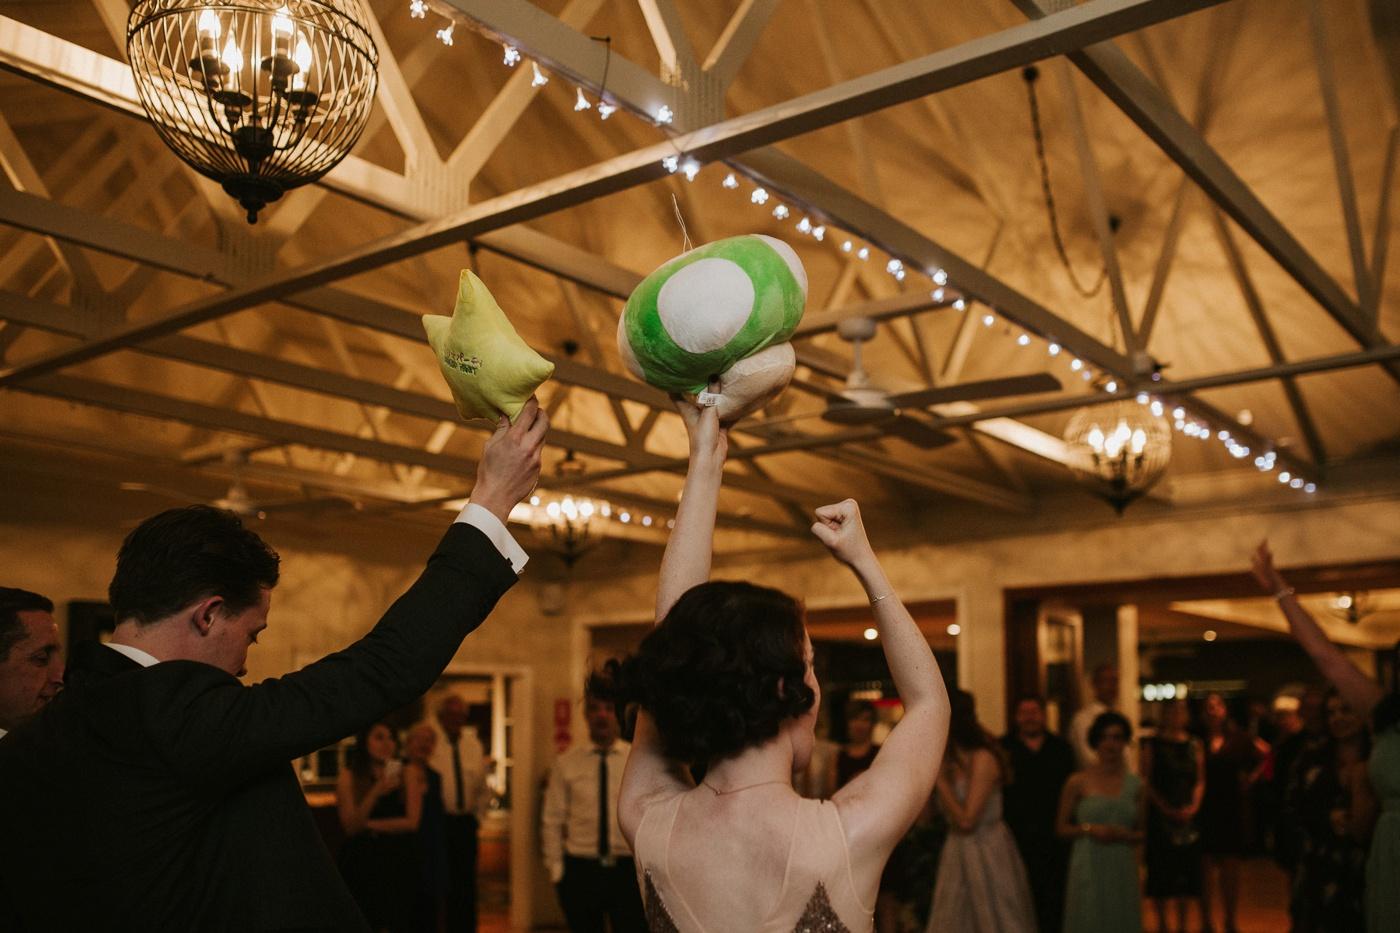 Emma&Morgan_Melbourne-Vintage-Elegant-Fun-Quirky-Yarra-Valley-Vineyard-Wedding_Melbourne-Wedding-Photography-108